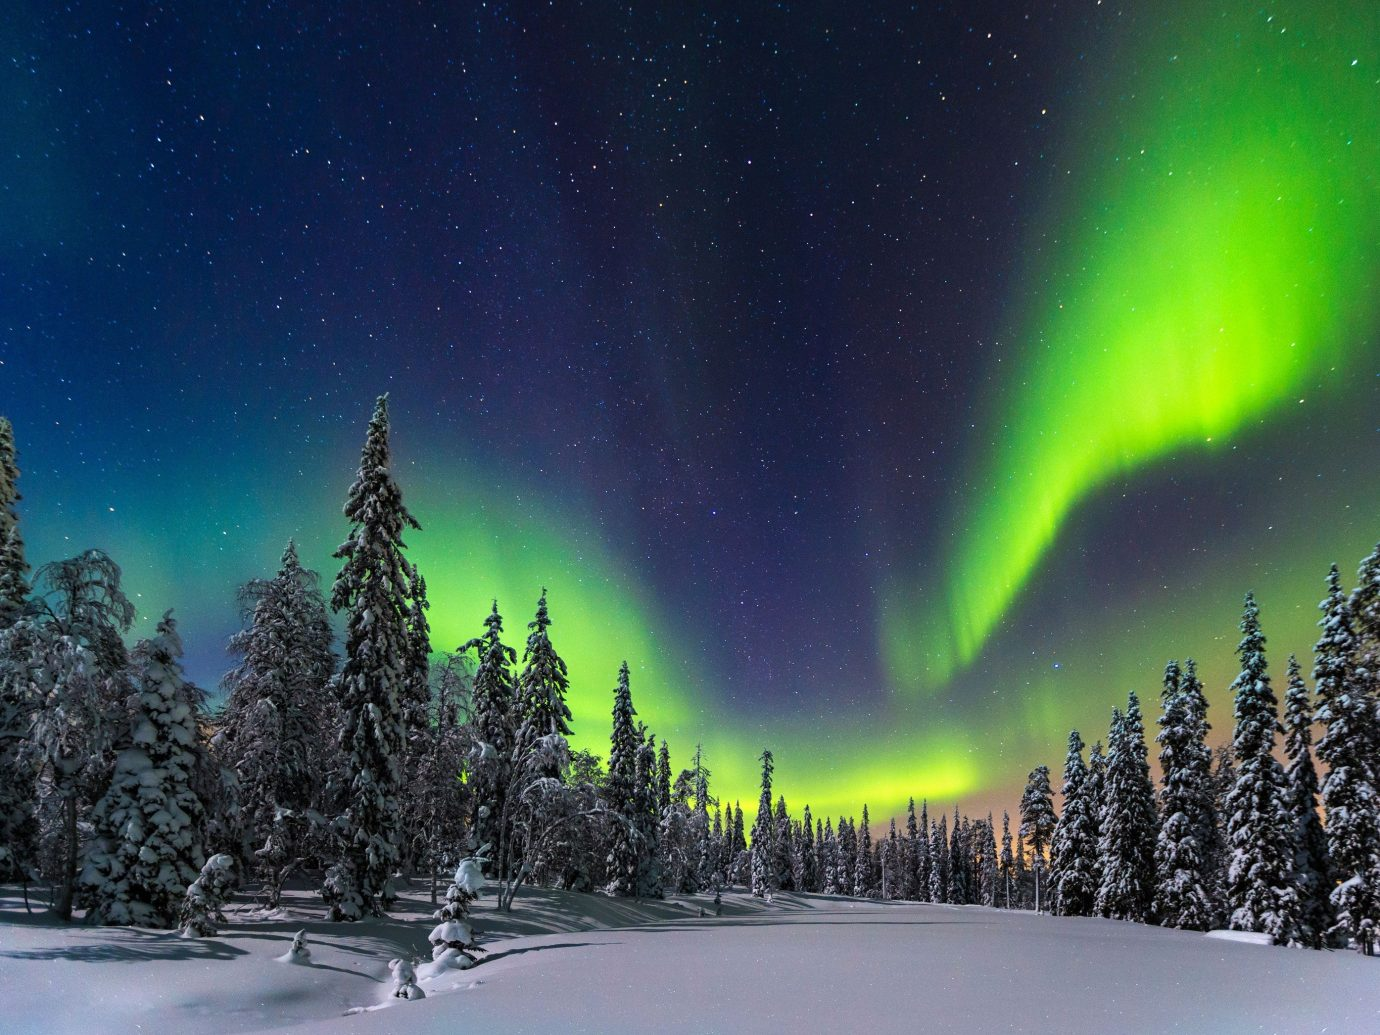 Trip Ideas tree outdoor snow aurora Nature atmosphere surrounded Night Sky